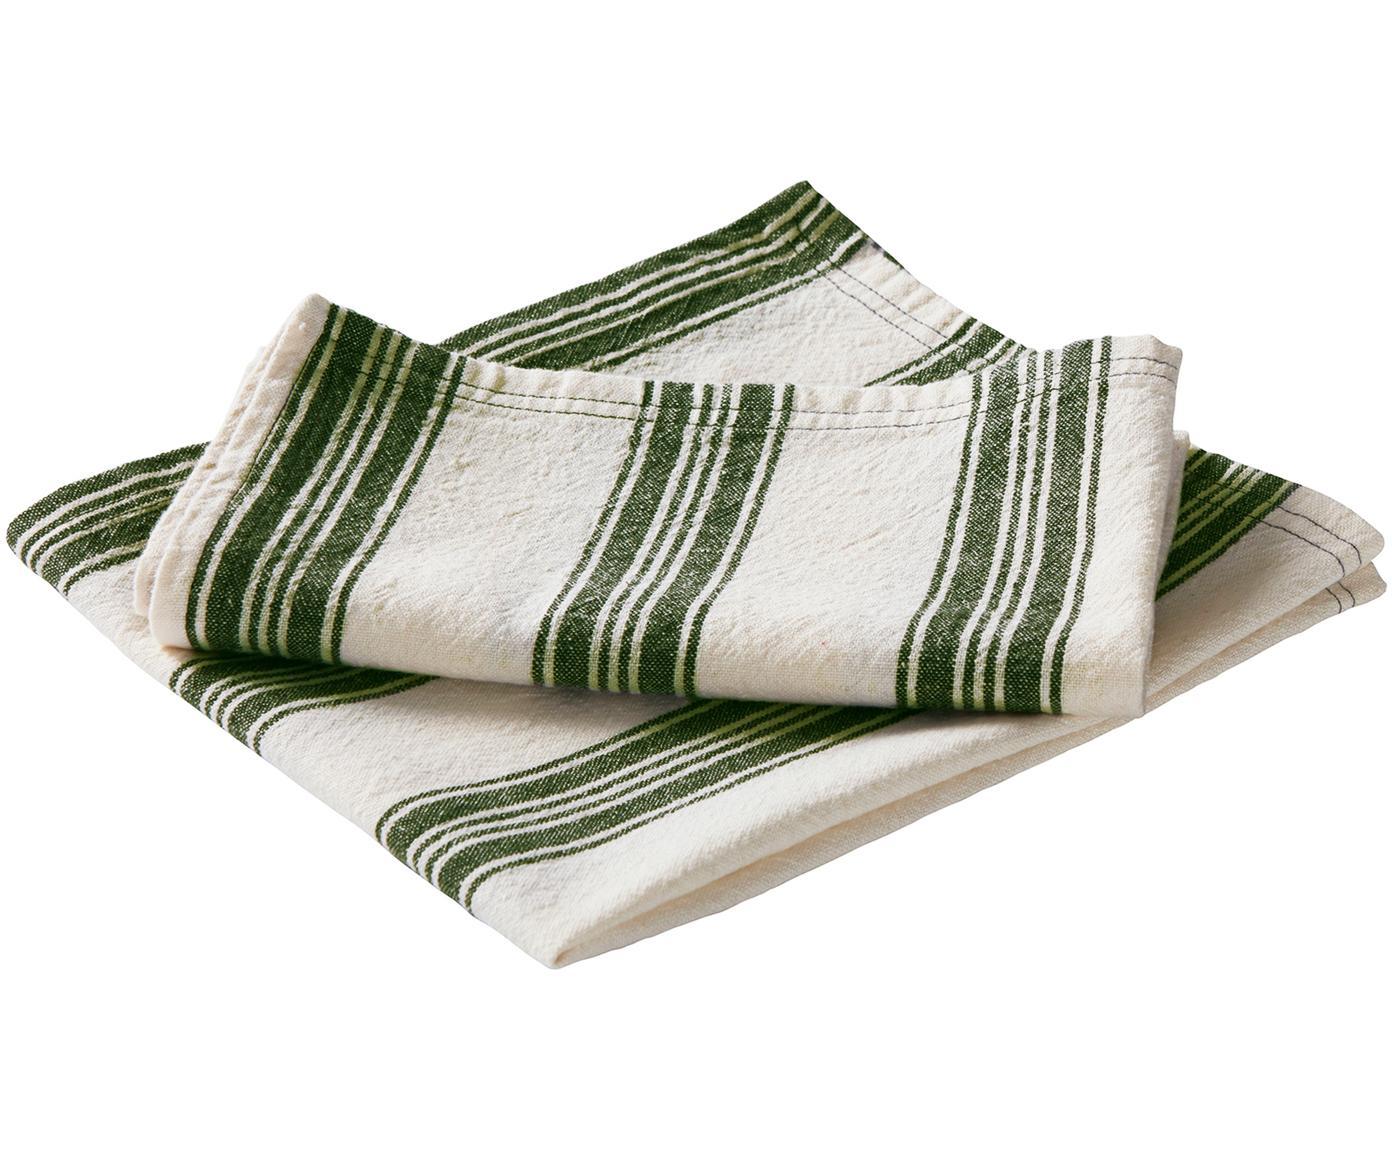 Servetten Abigail, 2 stuks, 80% katoen, 20% linnen, Gebroken wit, groen, 45 x 45 cm